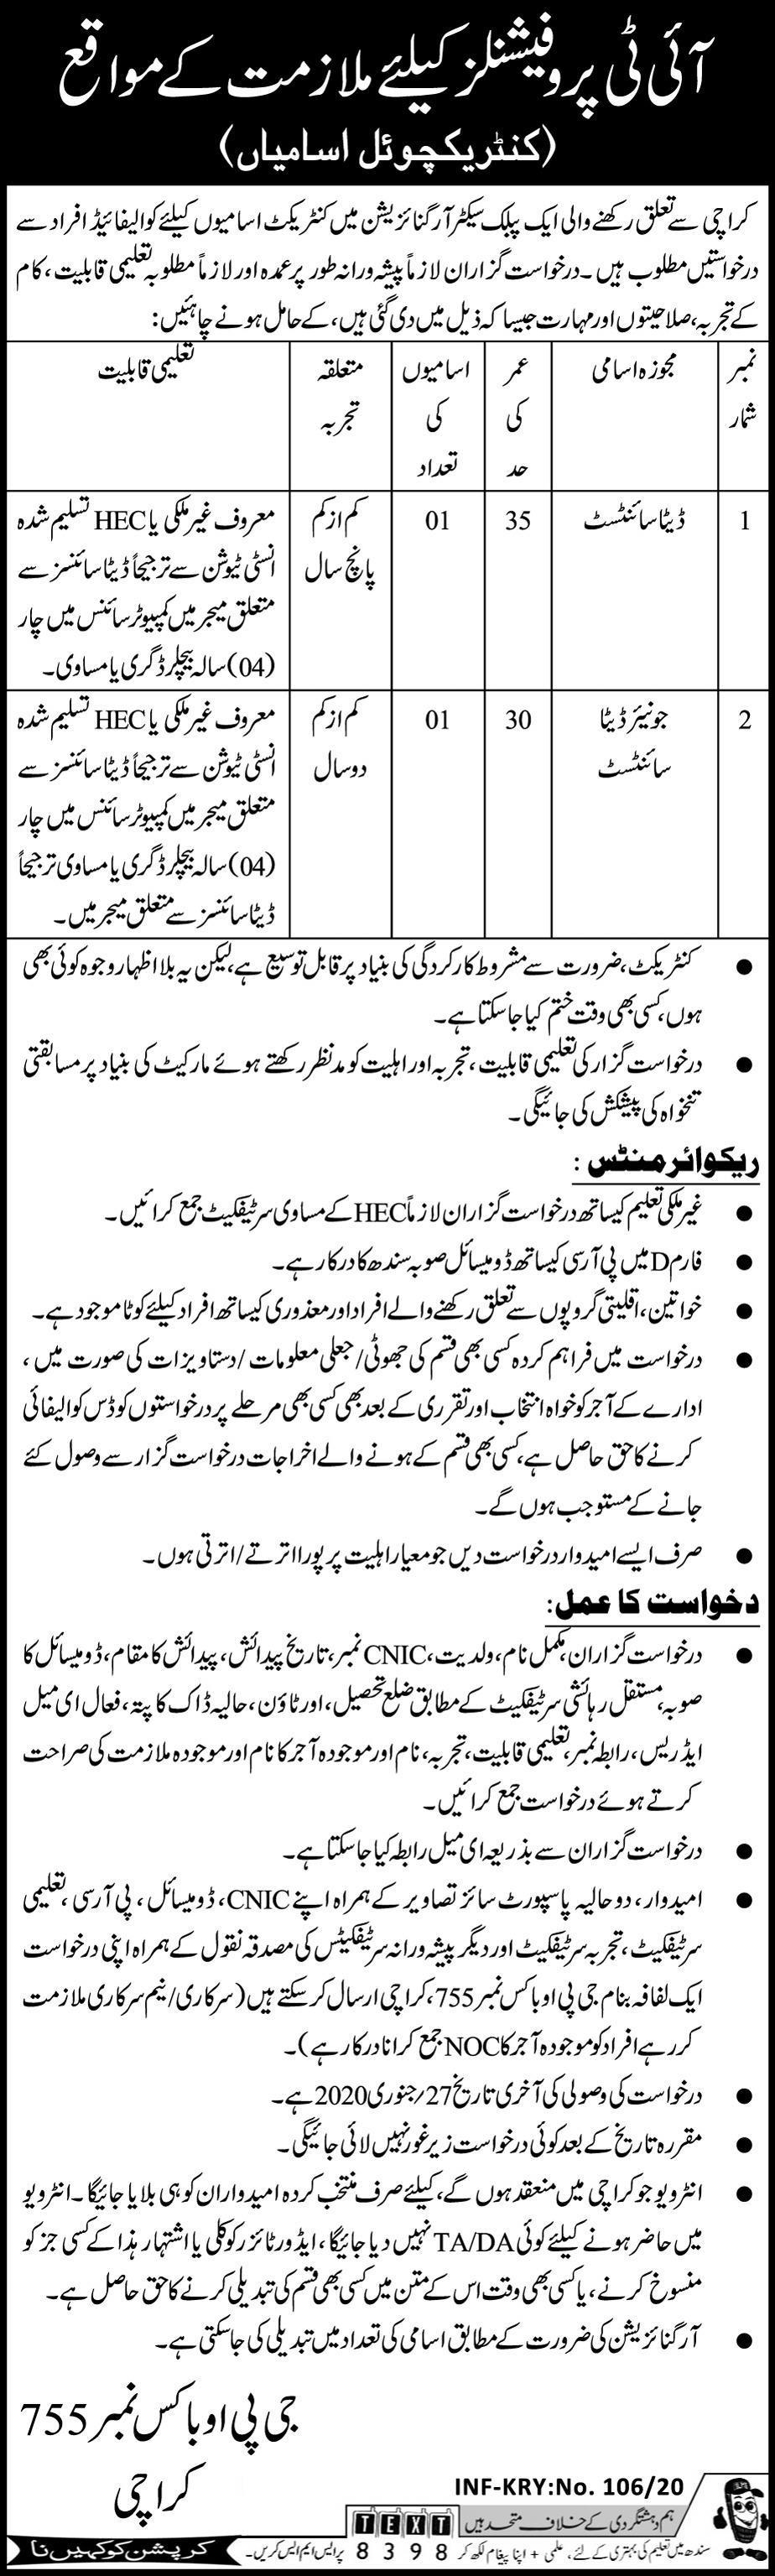 Public Sector Organization Latest Jobs 2020 in Karachi